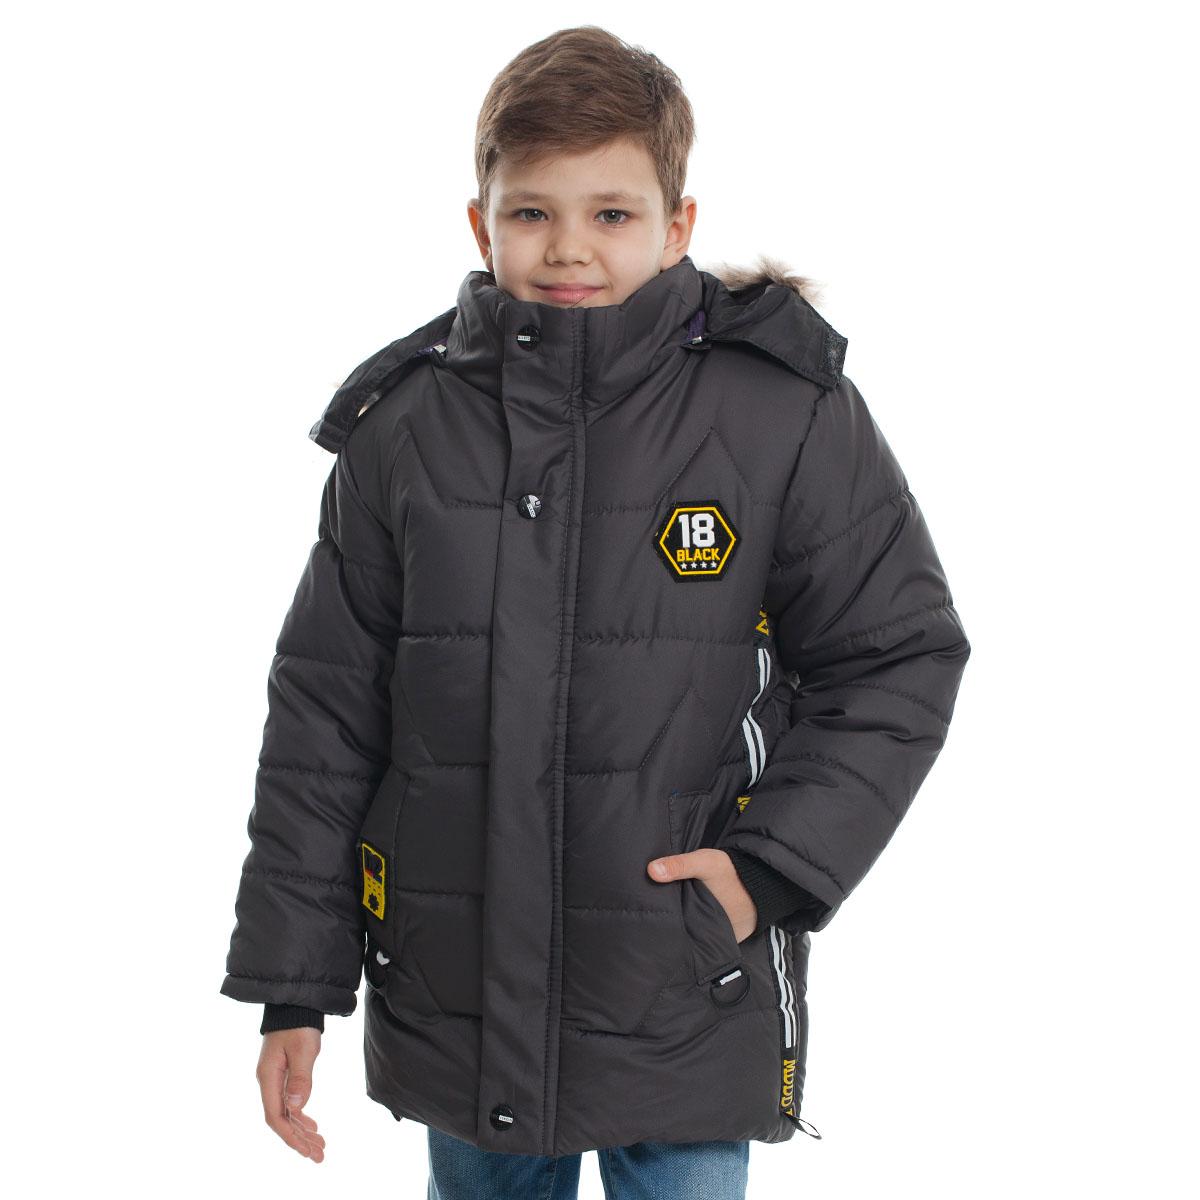 Куртка утепленная Black18 куртка утепленная bazioni bazioni mp002xm0qszm